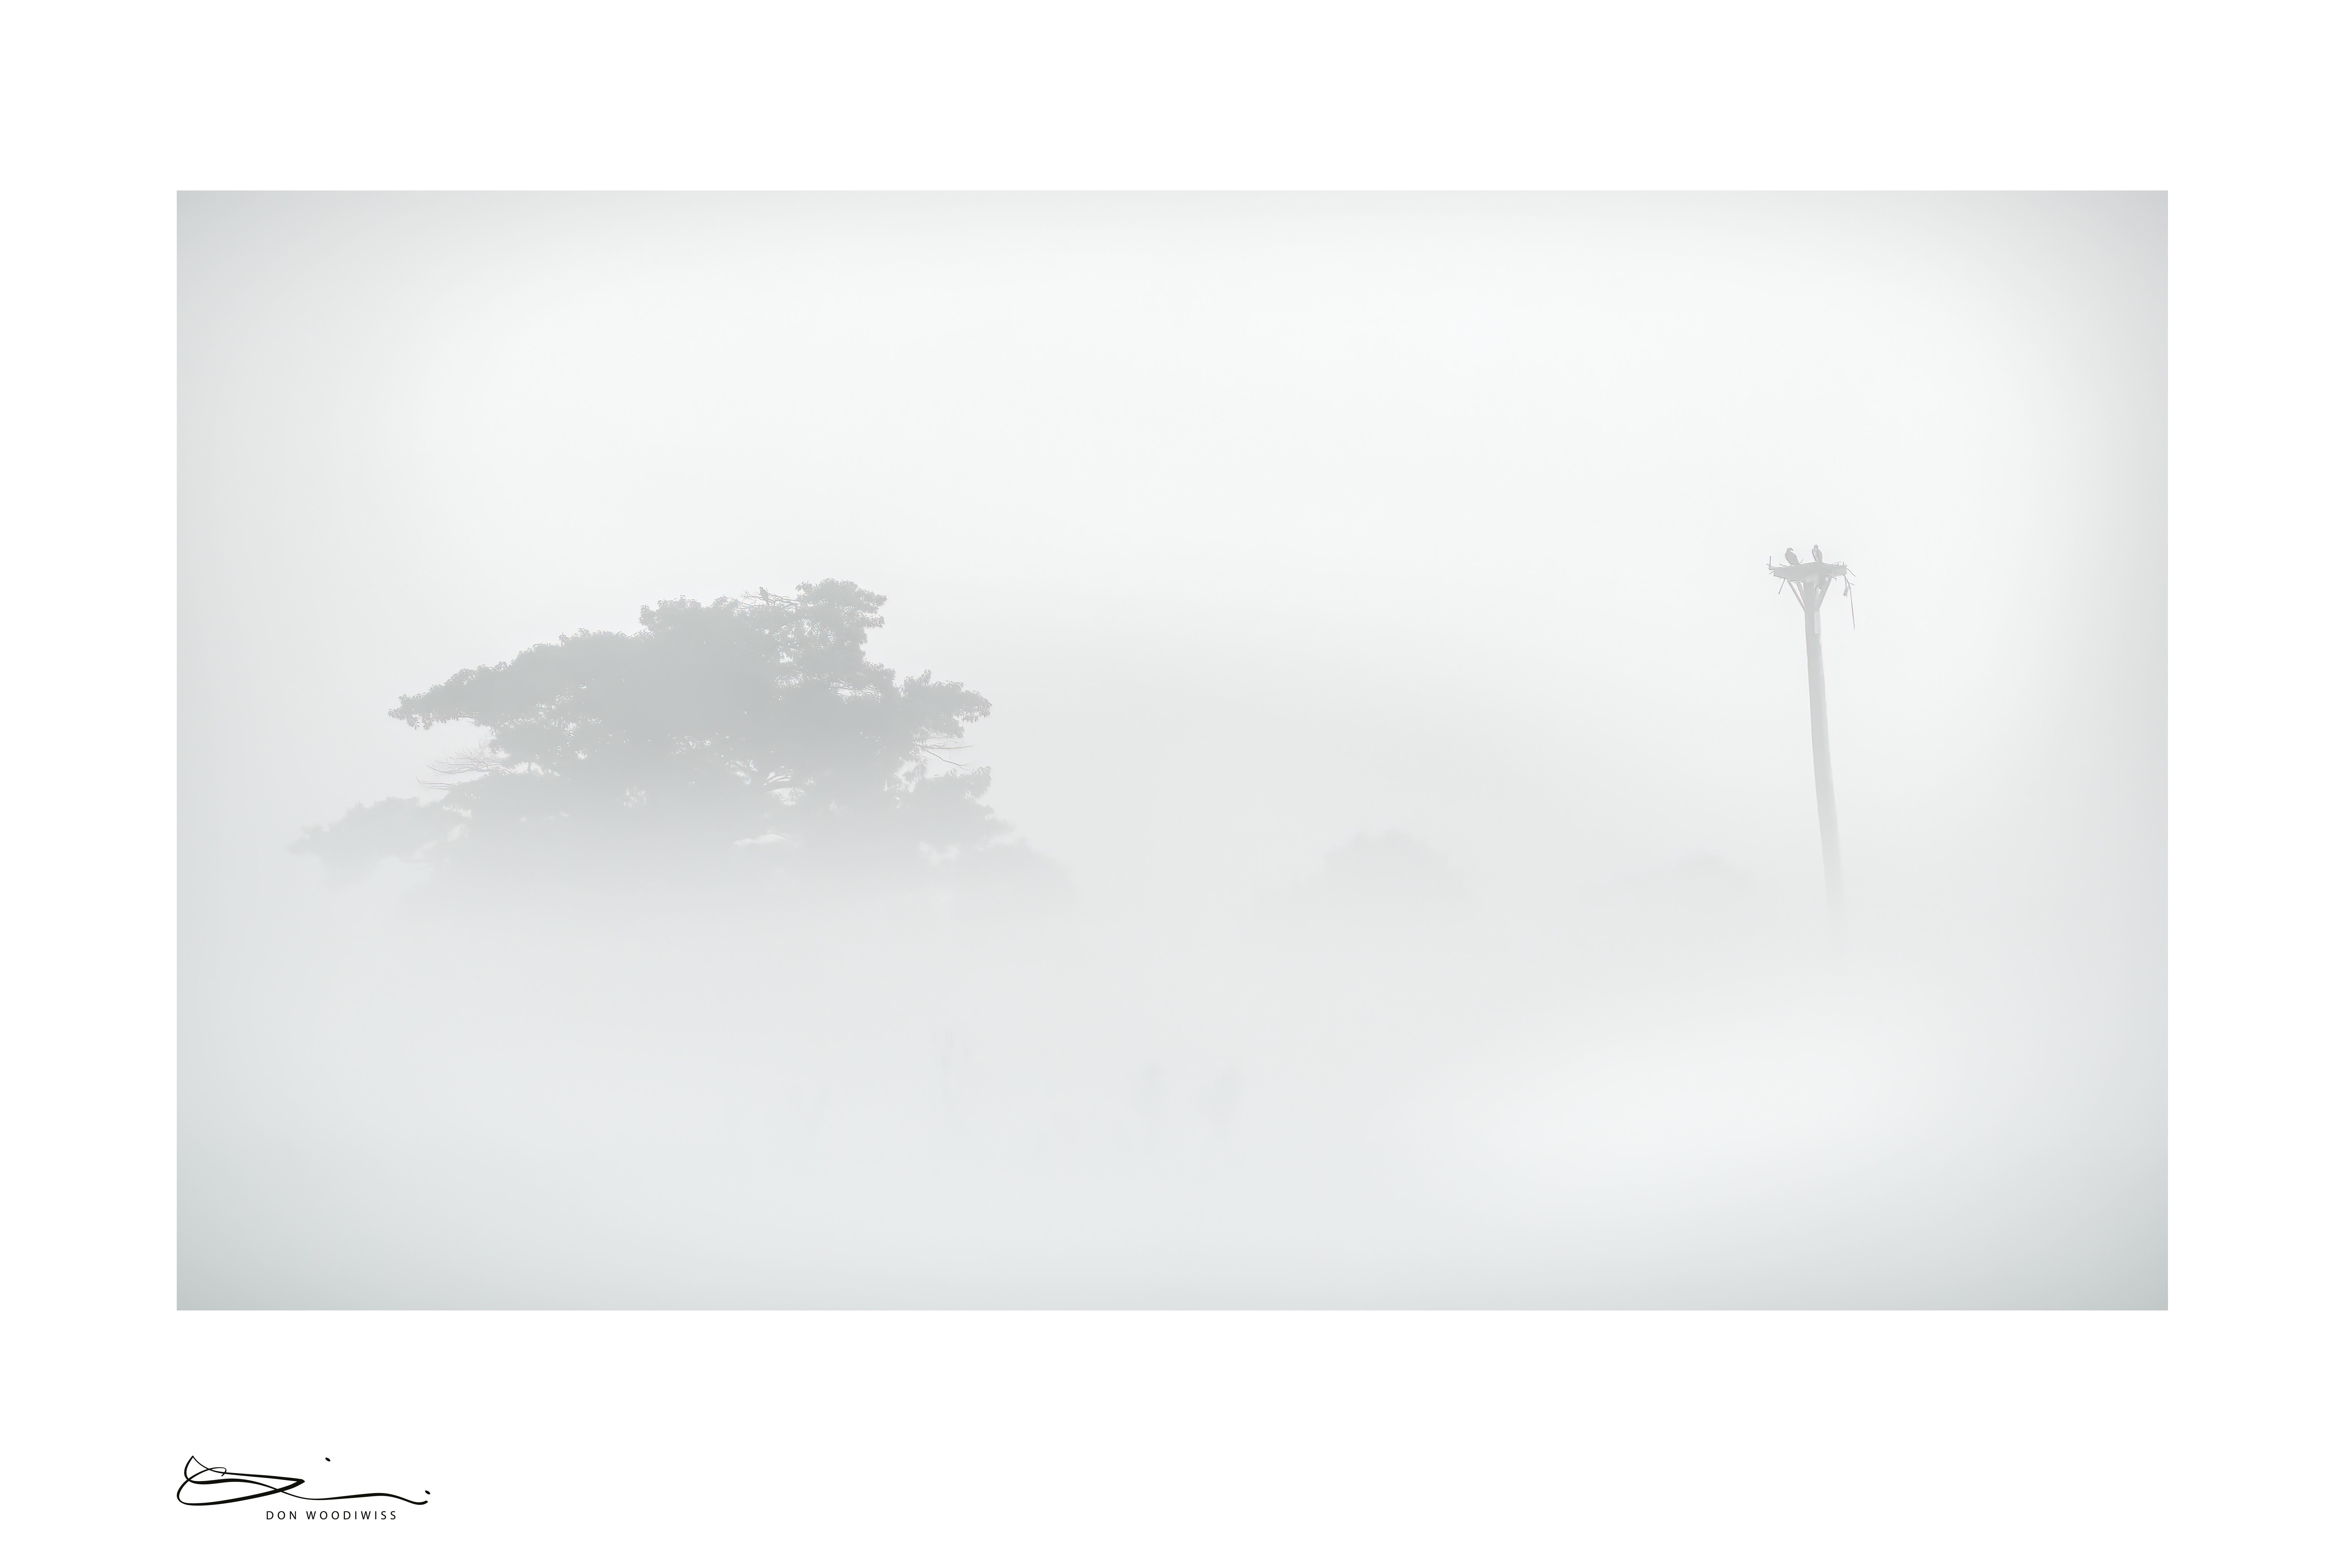 Don Woodiwiss-Woodiwiss Photography-osprey